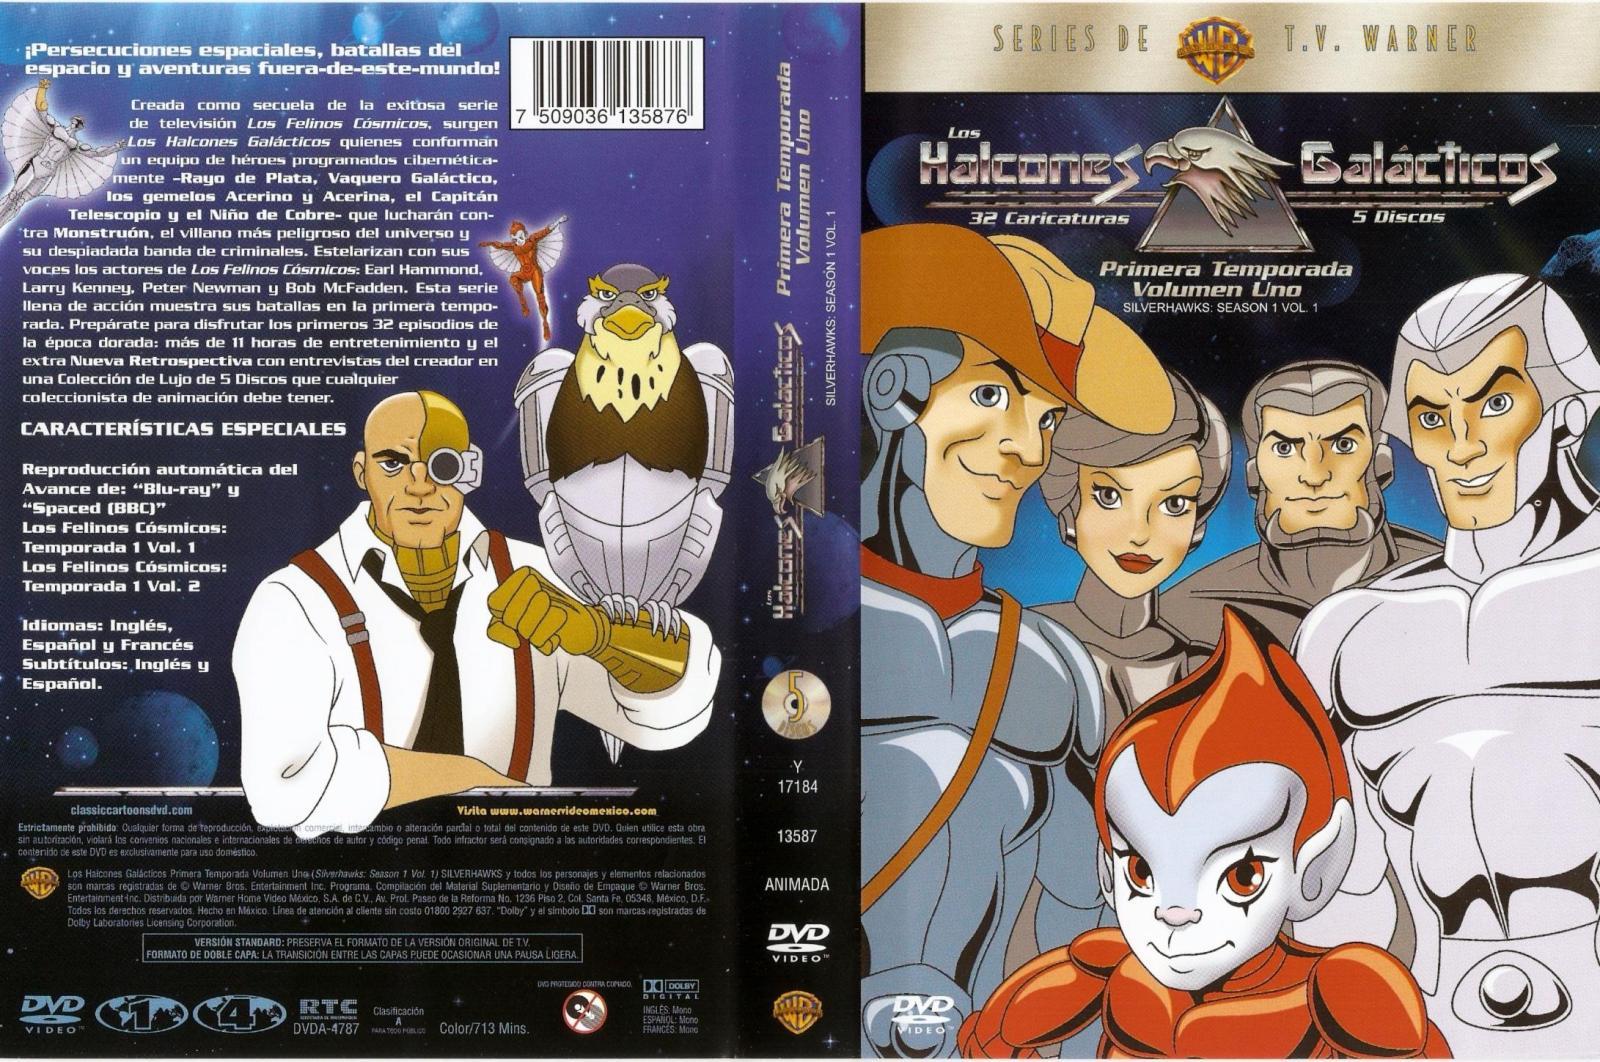 Serie Animada Latino Descargar Mega Silverhawks